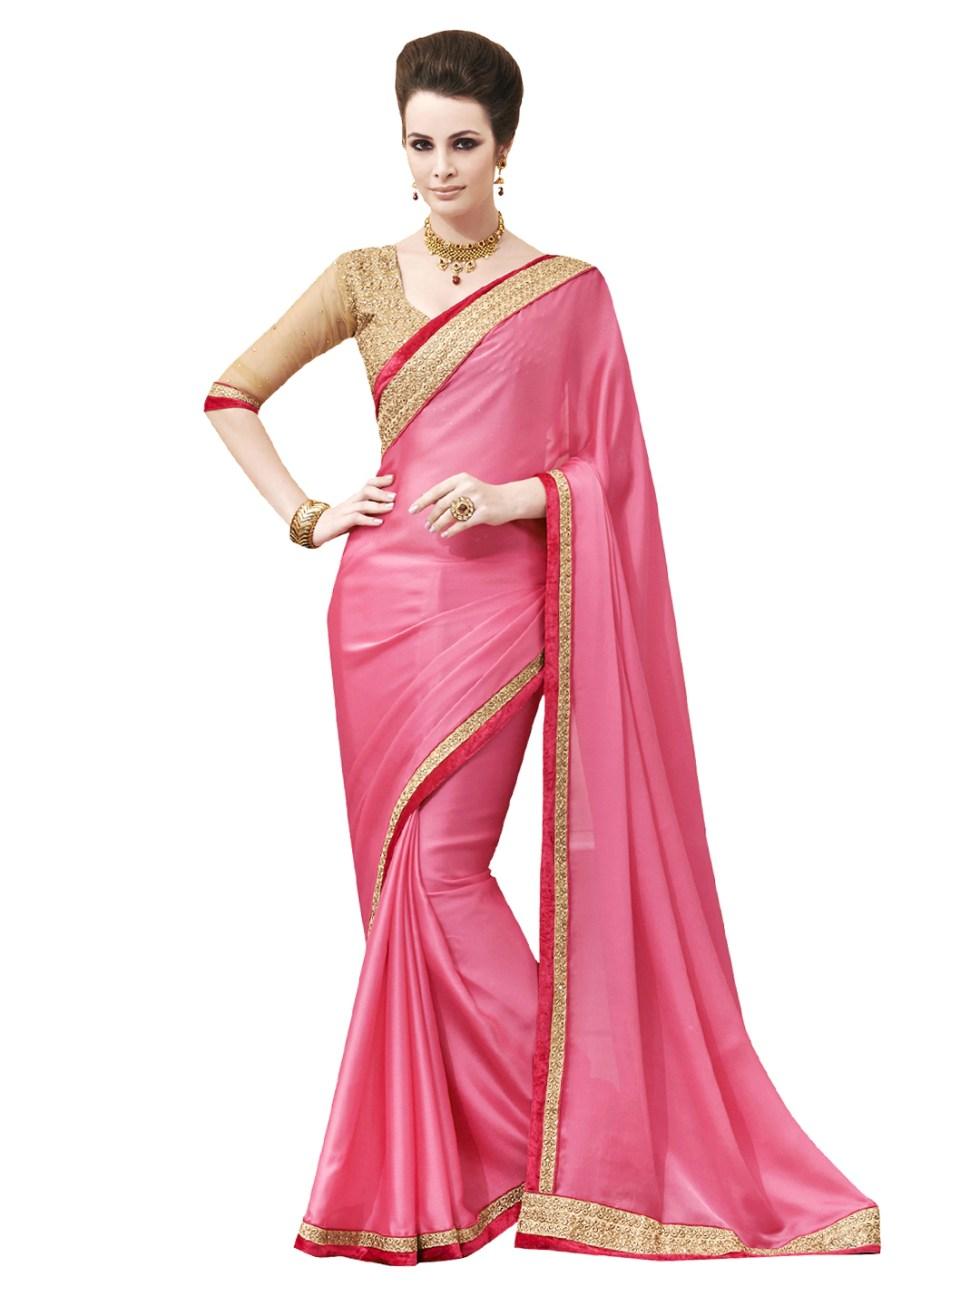 Myntra Indian Women Pink Chiffon Fashion Saree 594755 ...